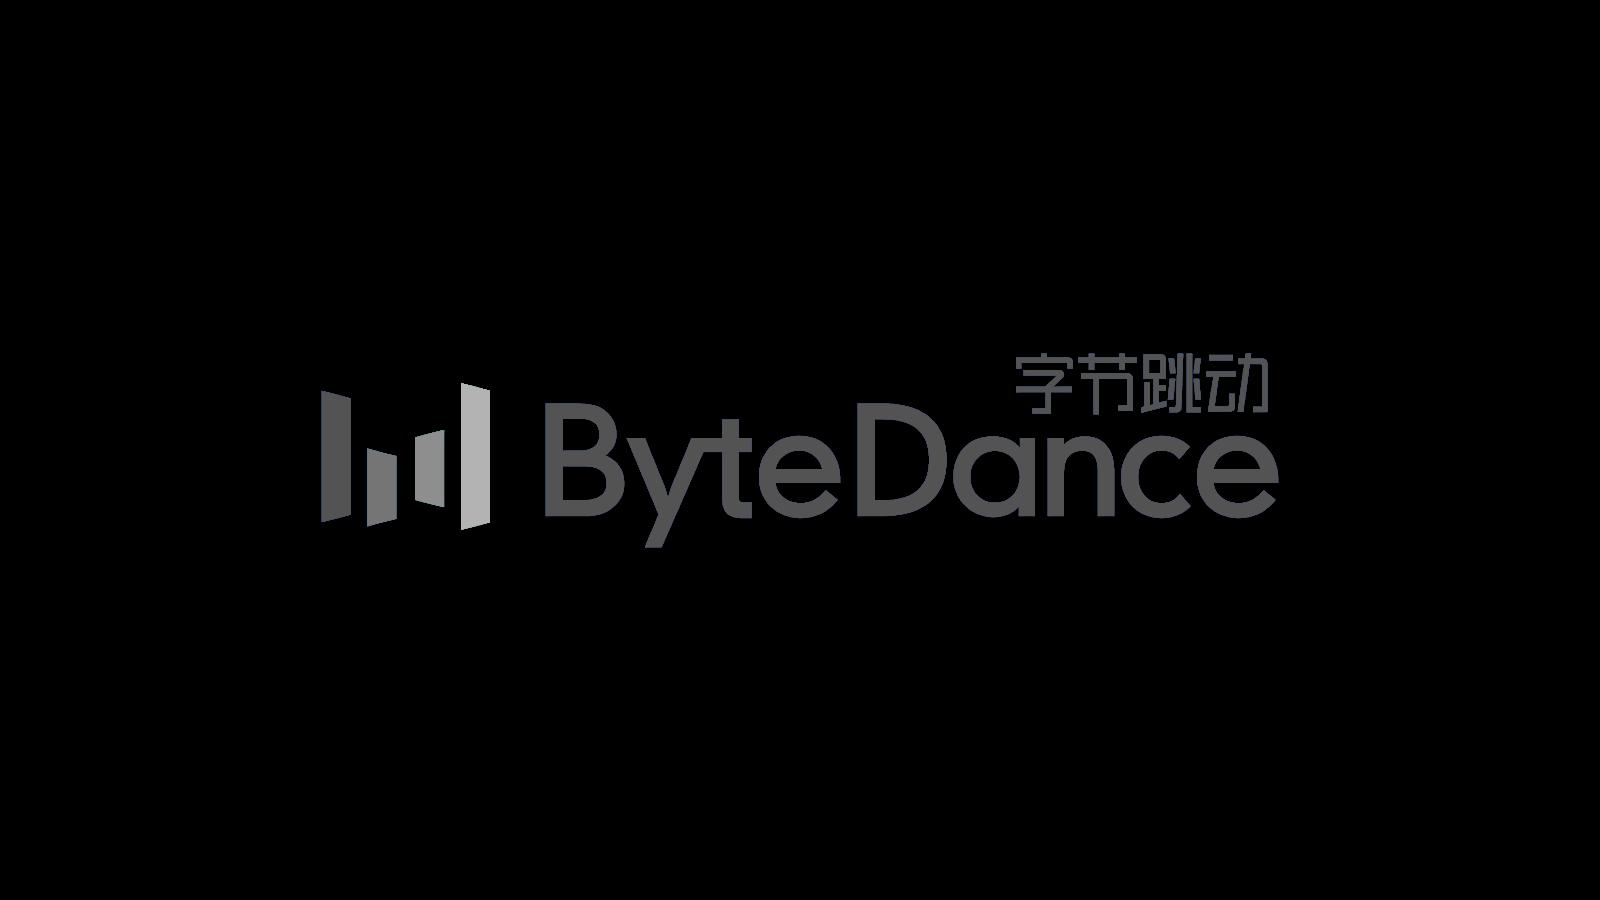 bytedance_meitu_4.png